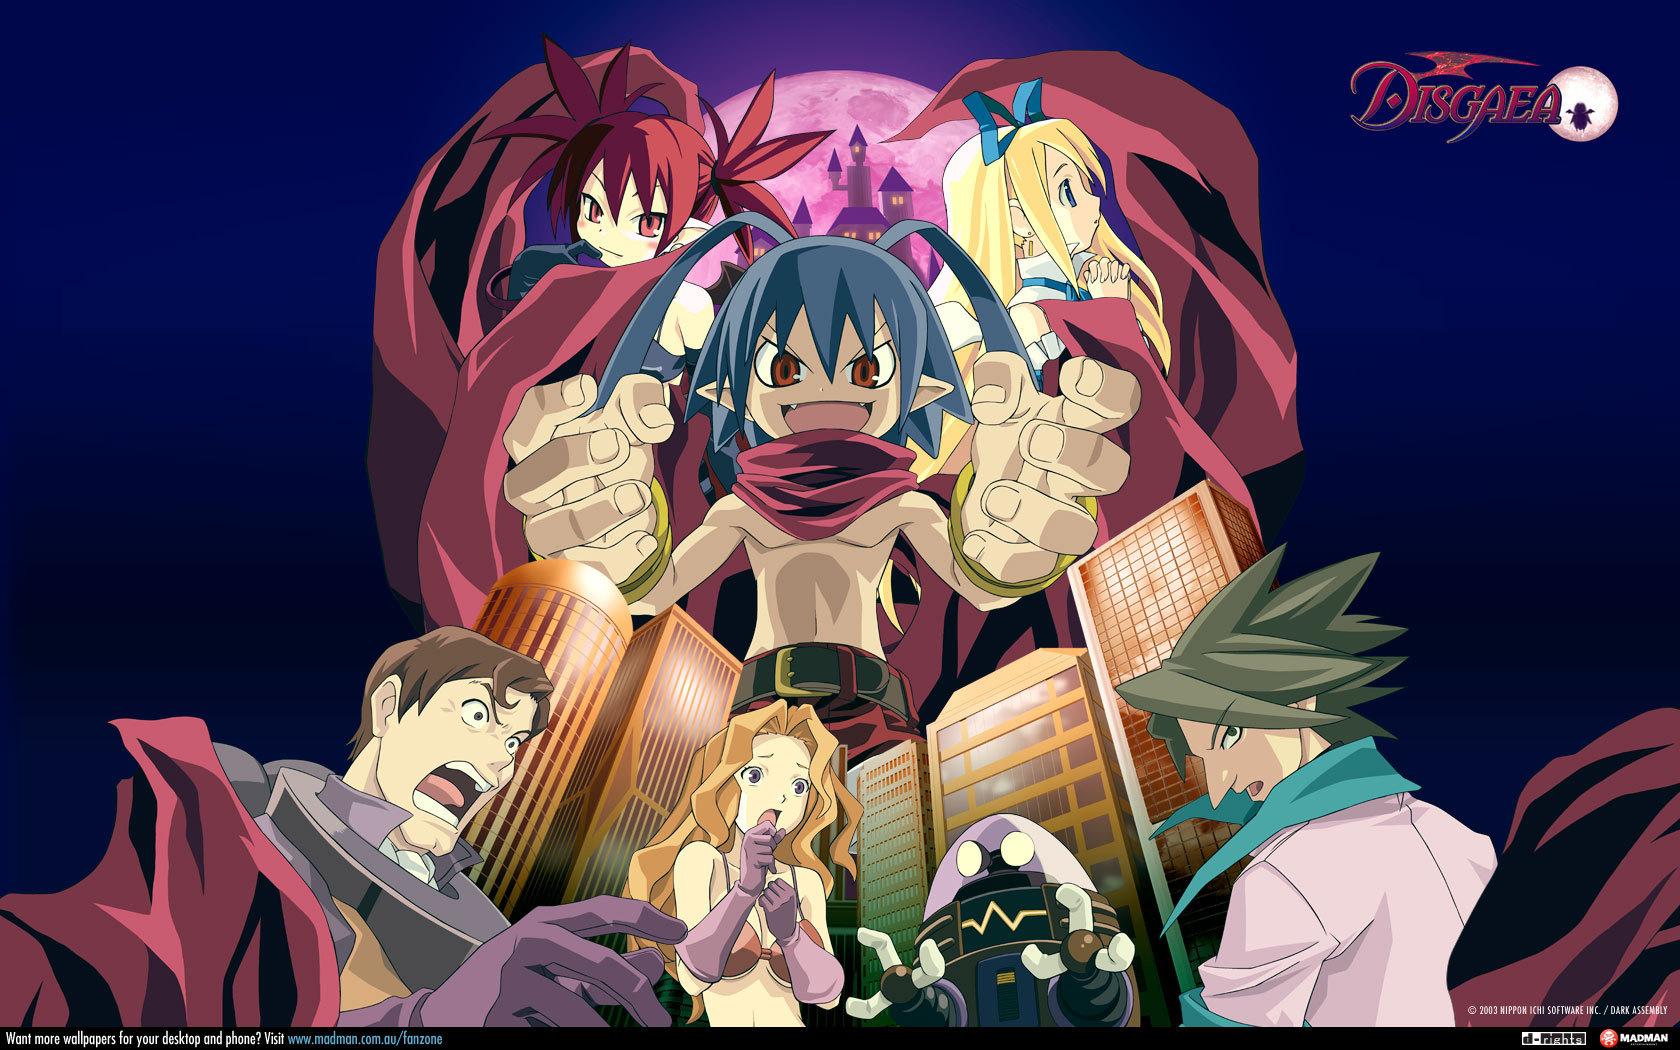 How To Make Anime Wallpaper Disgaea The Anime 2006 Anime Nonsense Gt The Cinema